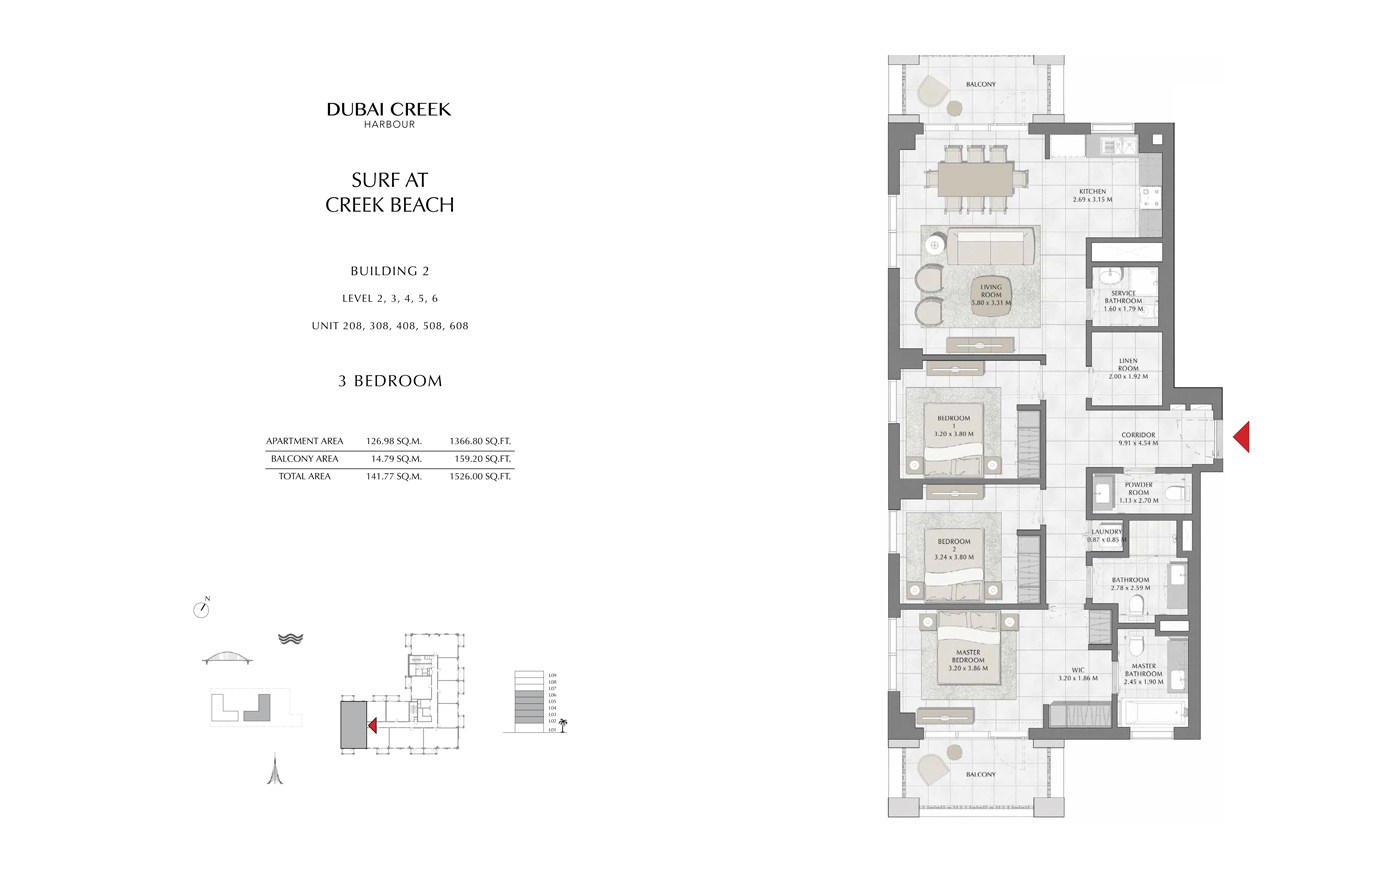 Building 2, 3 Bedroom Level 2, 3, 4, 5, 6, Size 1526 Sq Ft